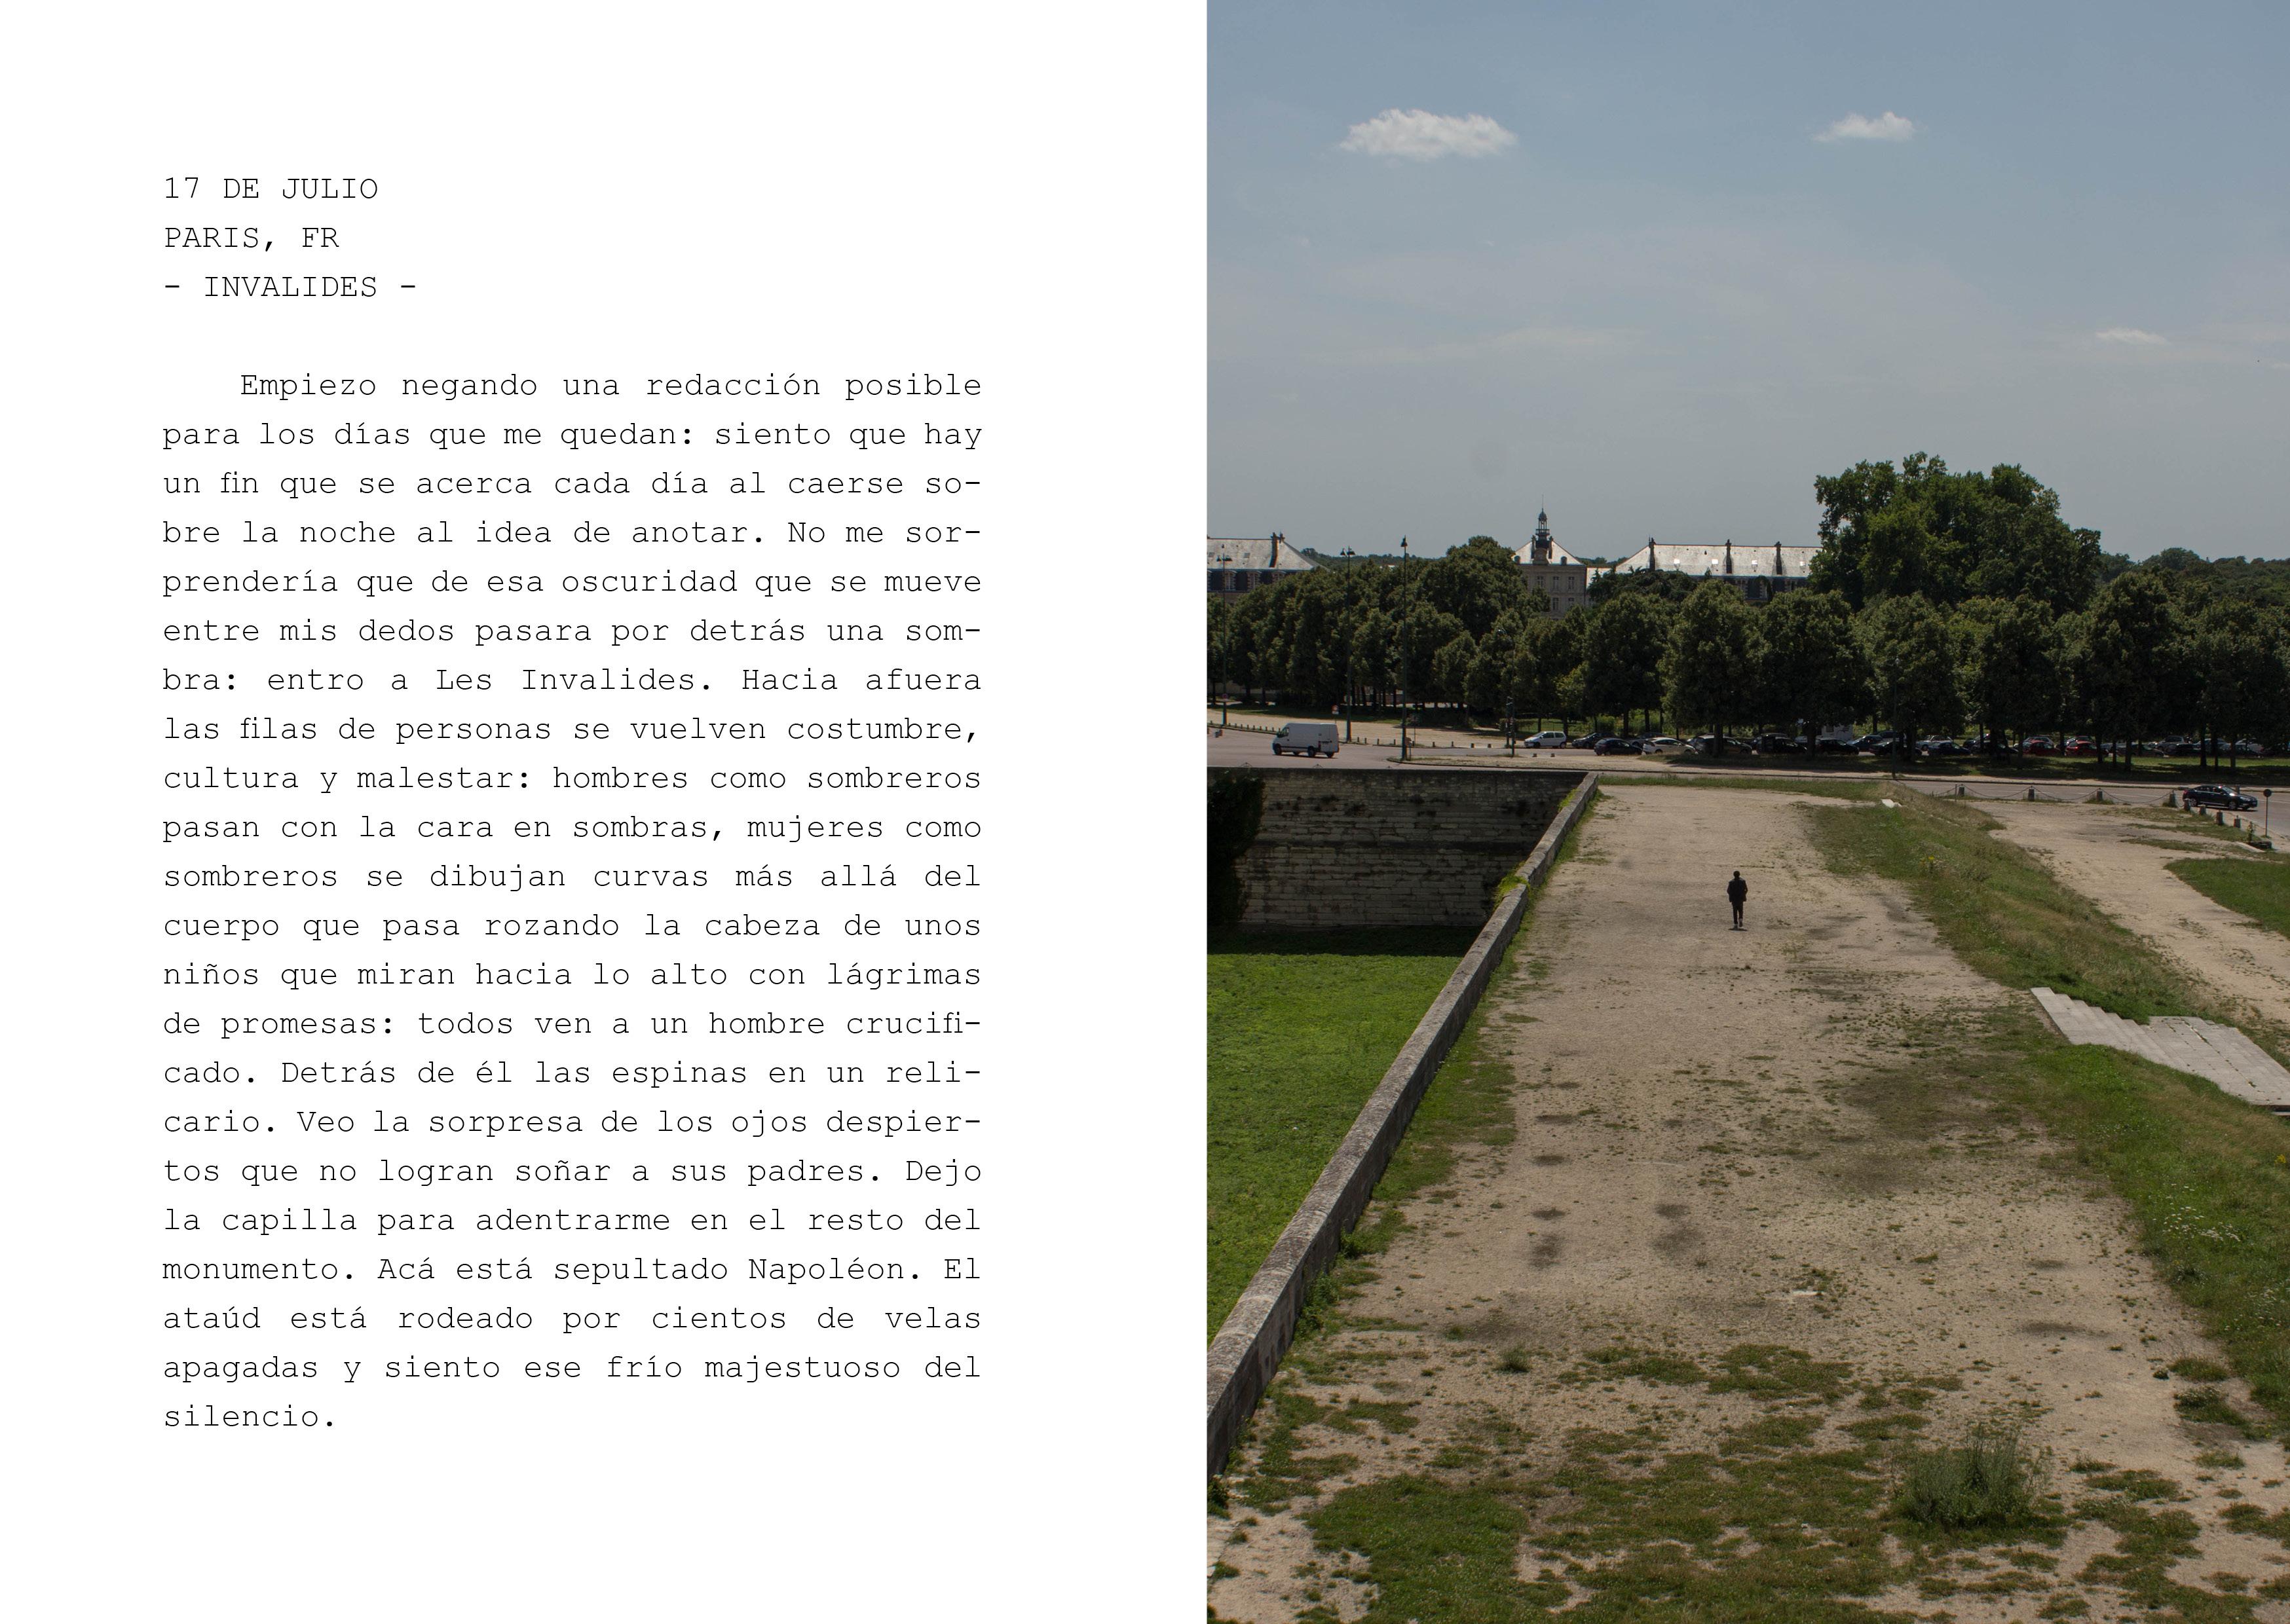 NOUVELLE CONSTELATION - PRUEBA 1381